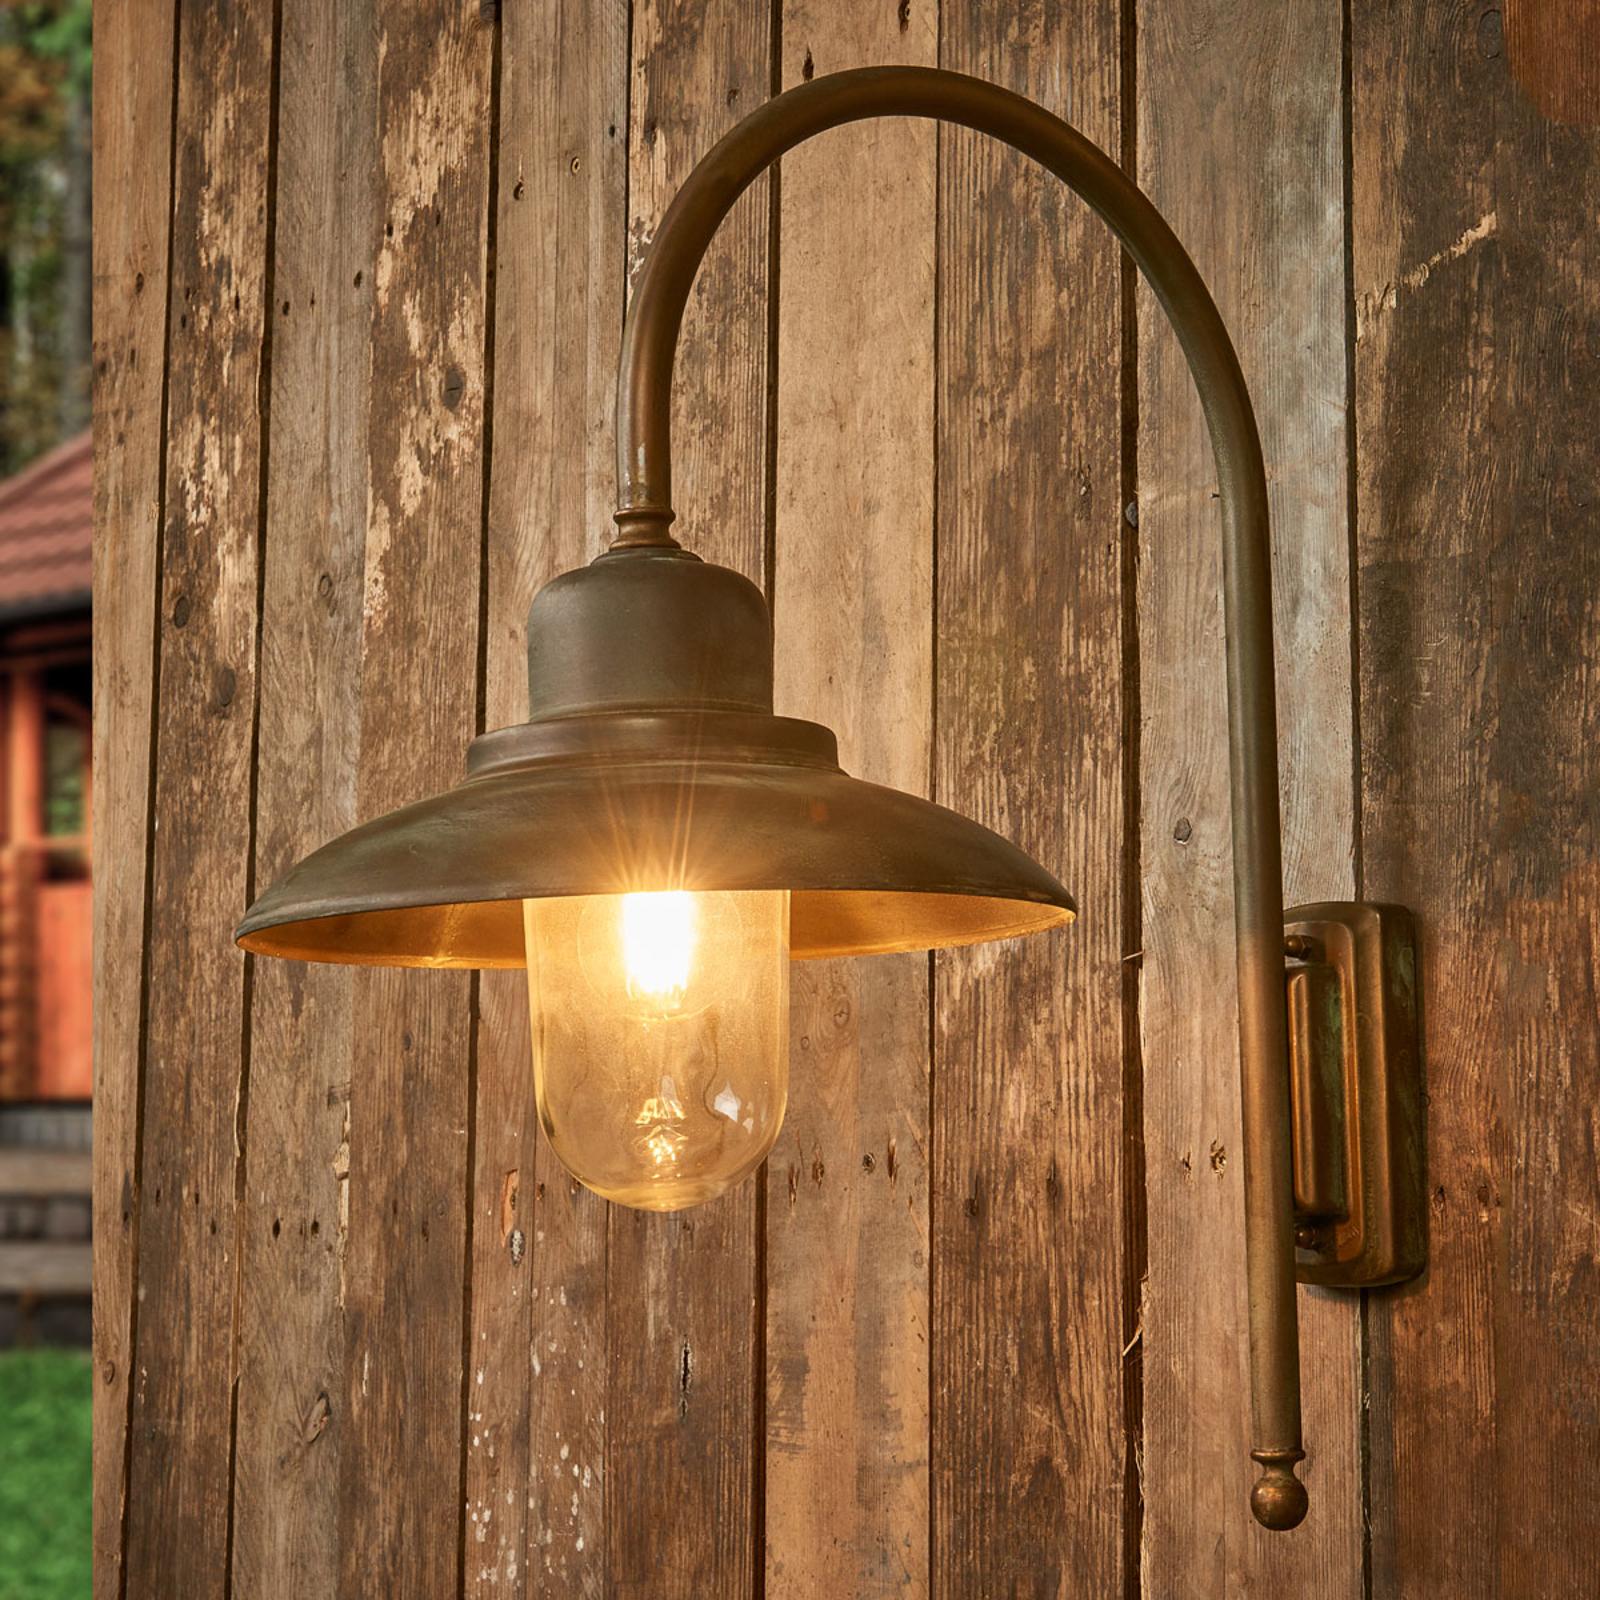 Casale - een charmante buitenwandlamp